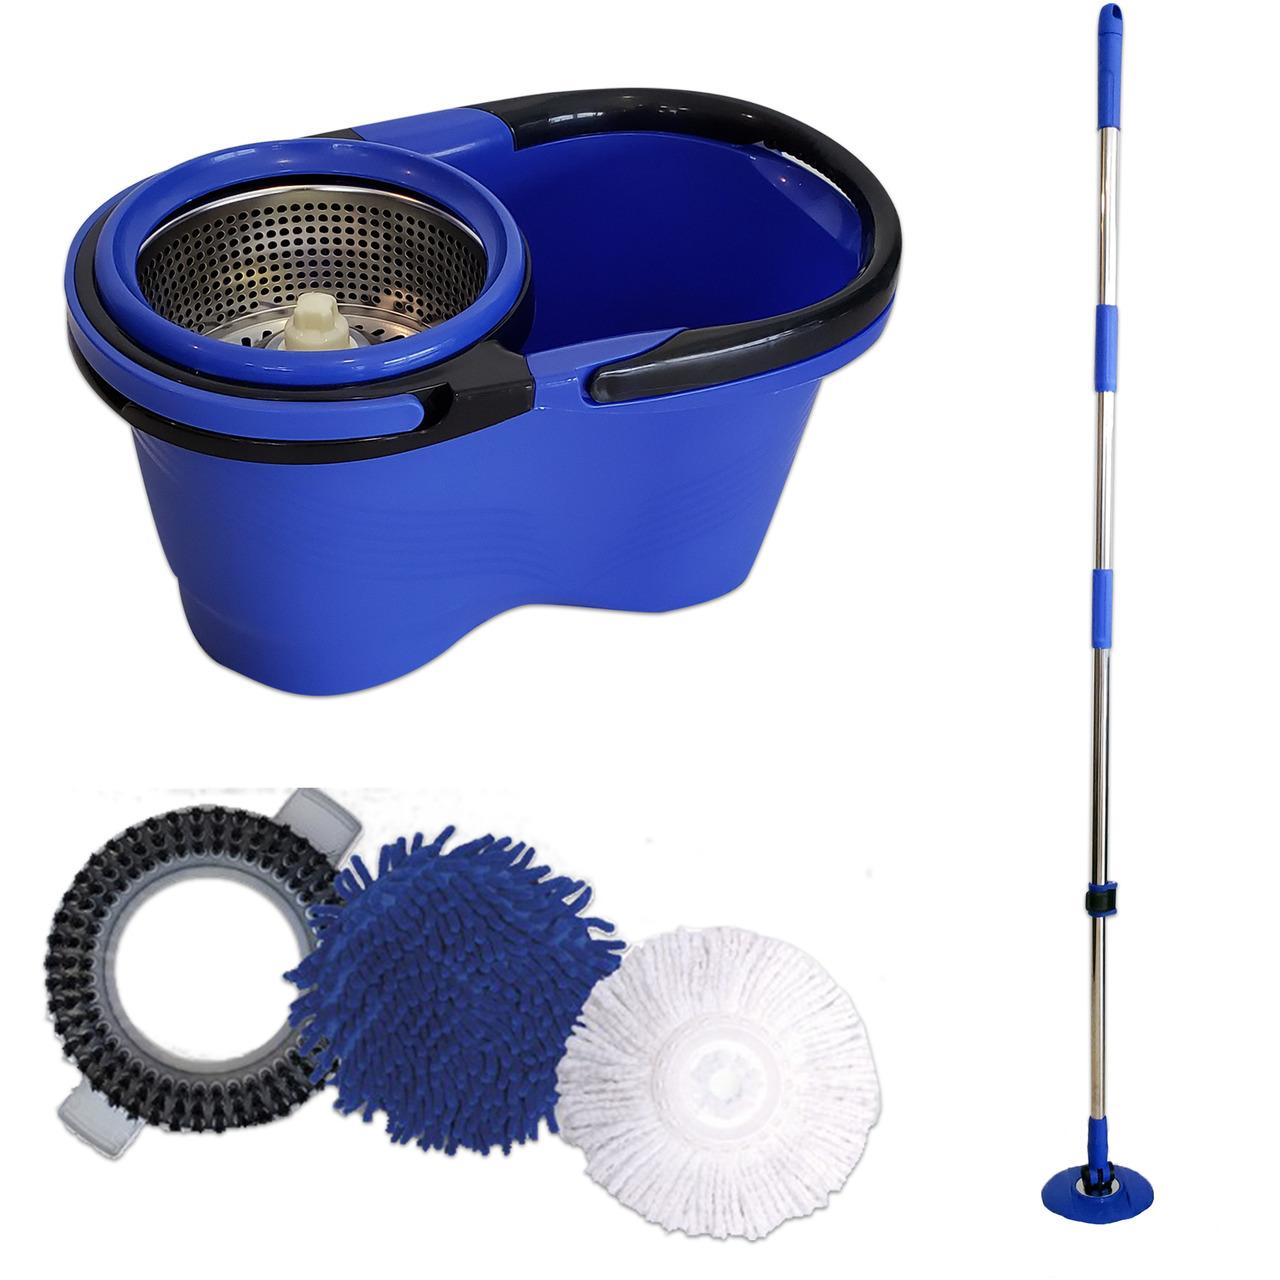 Balde Perfect Mop Pro Cesto Inox 3 Refis Limpa Vidros e Luvas